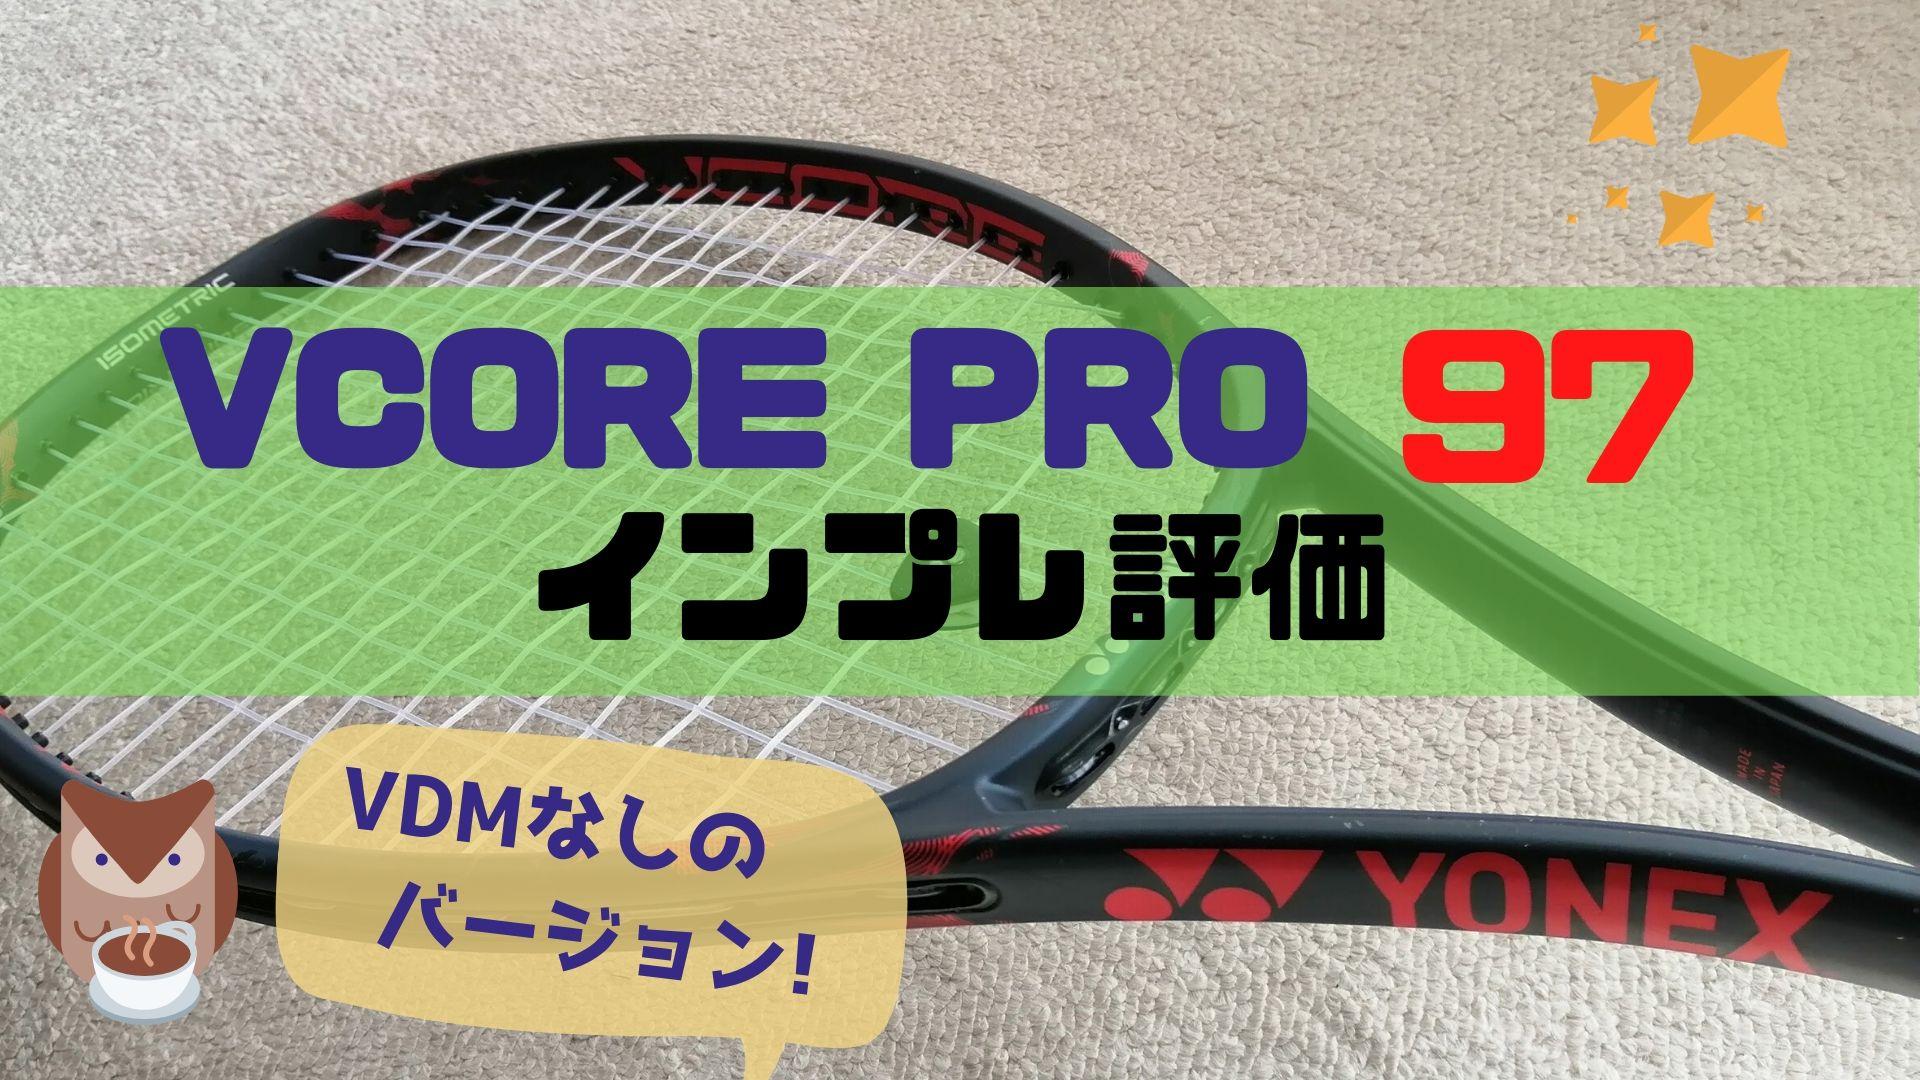 YONEX VCORE PRO 97【インプレ】Vコアプロ97 ヨネックス